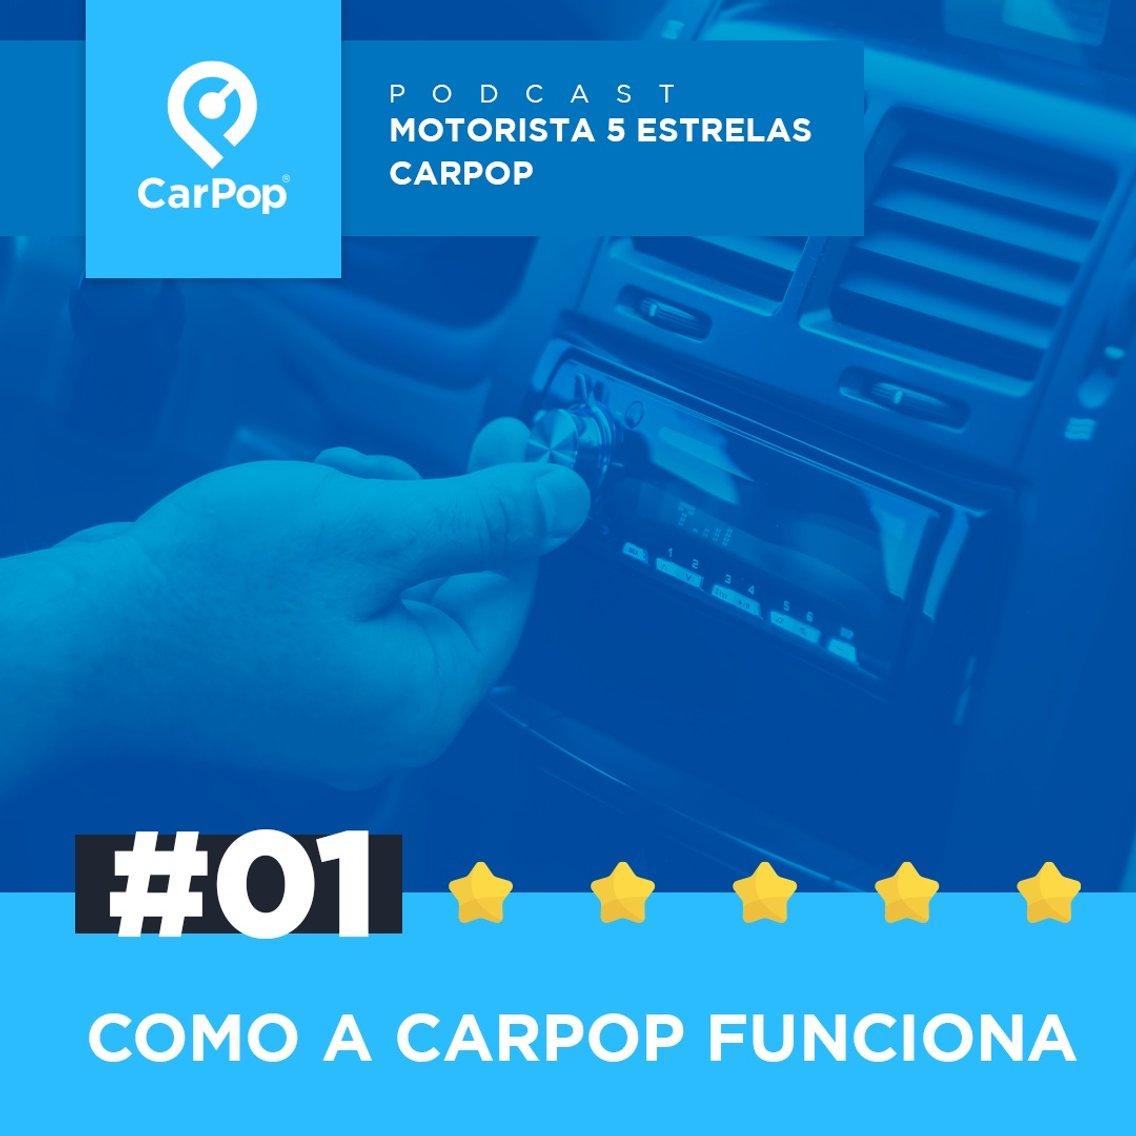 Motorista 5 Estrelas CarPop - Cover Image